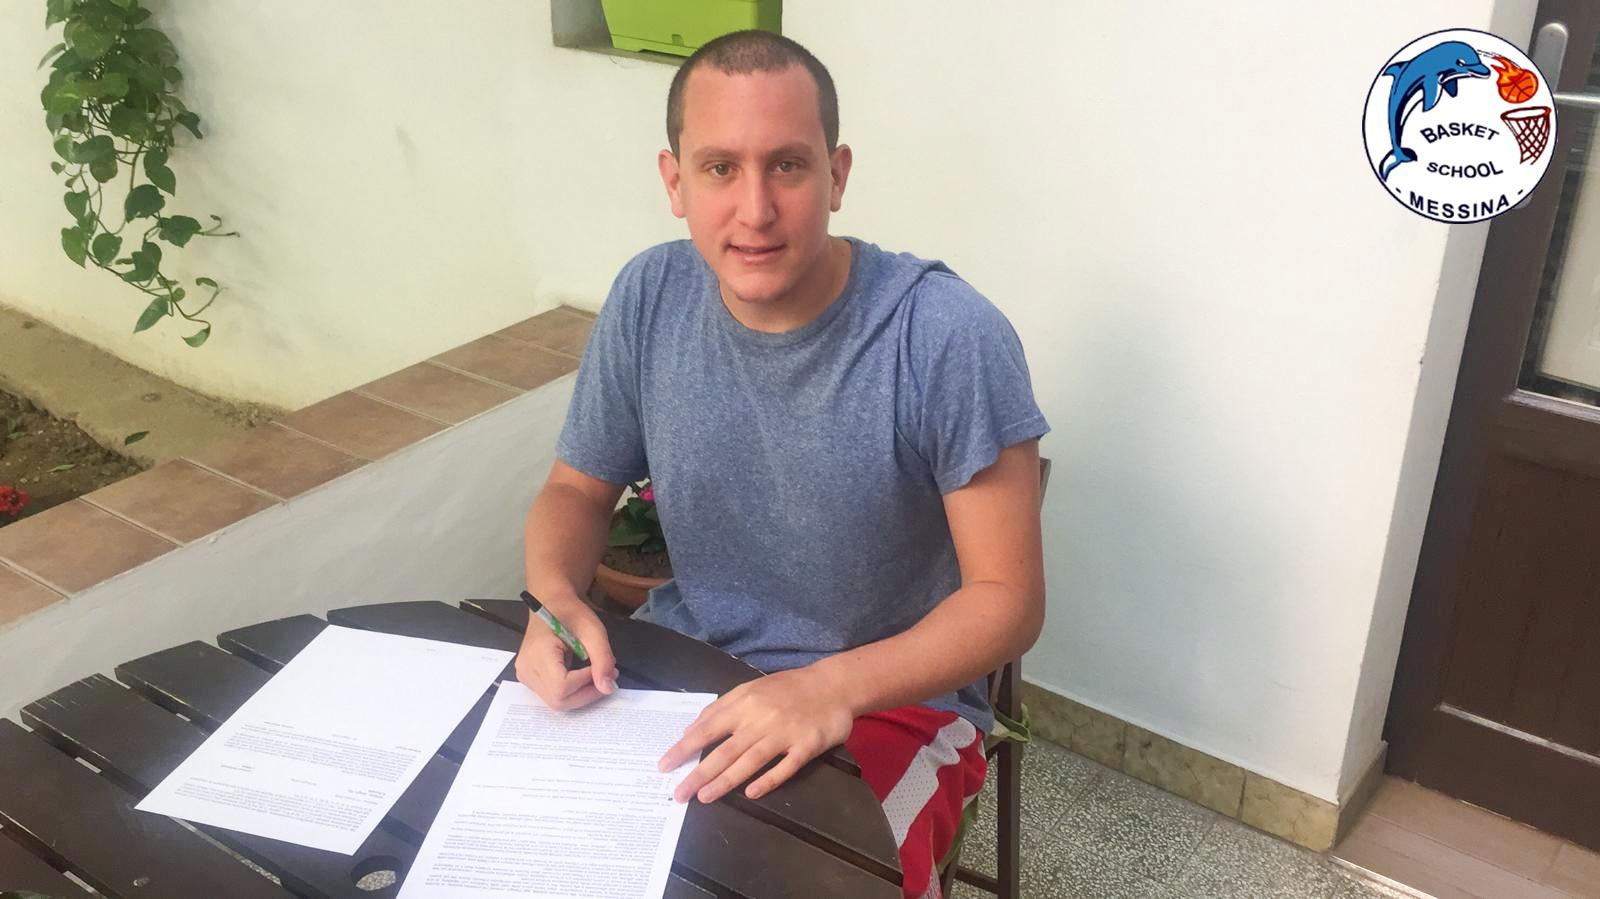 ZS Group Messina: anche Lorenzo Genovese rimane in giallorosso